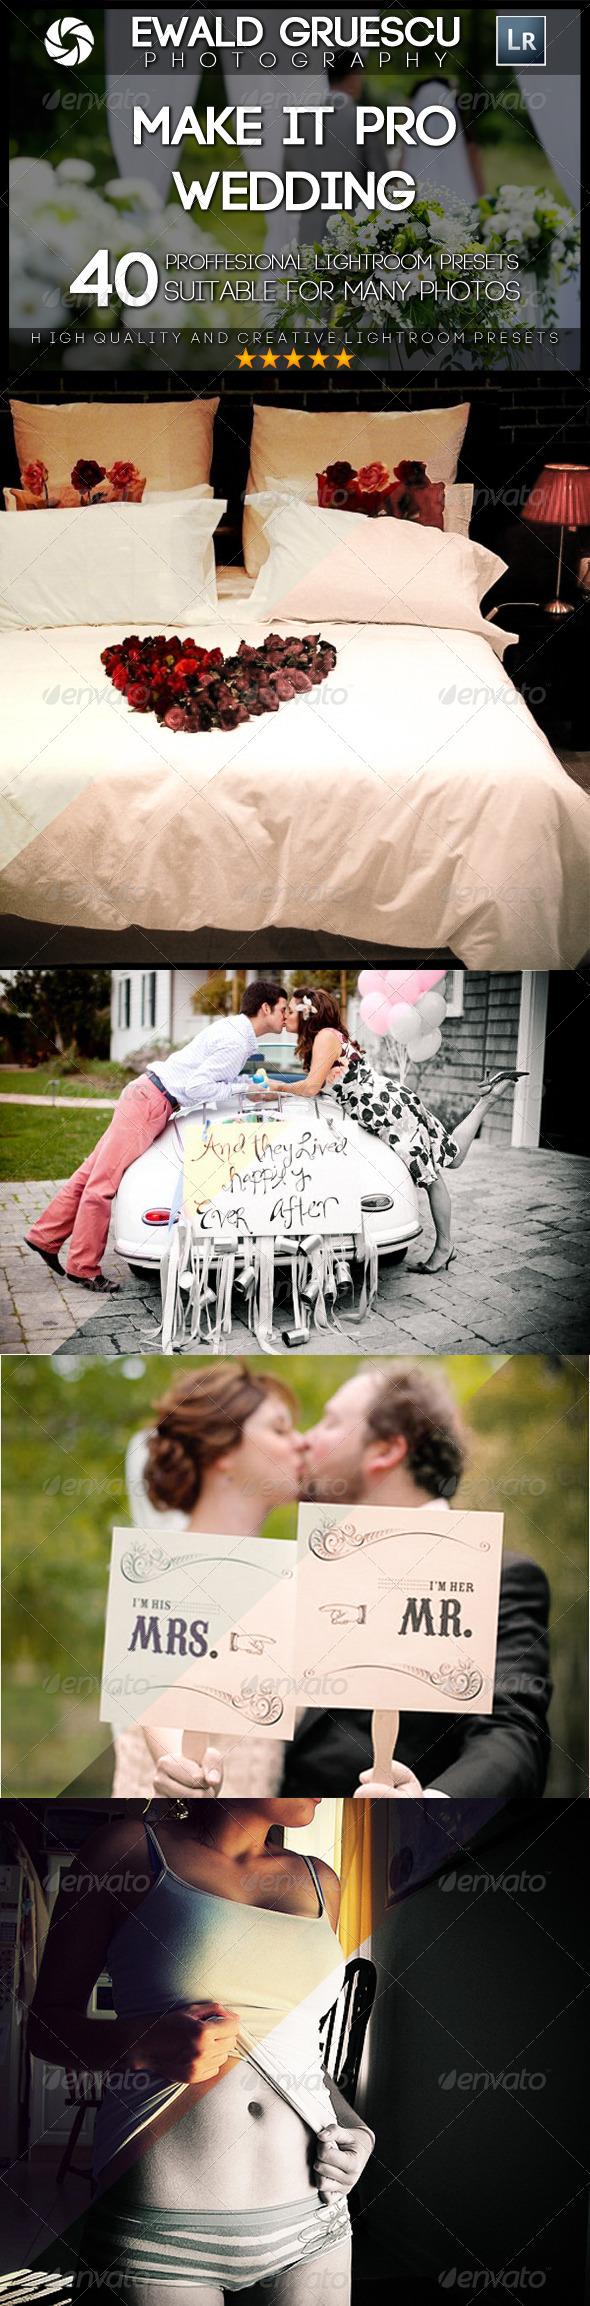 GraphicRiver Make it PRO Wedding Part II Lightroom Presets 7465196